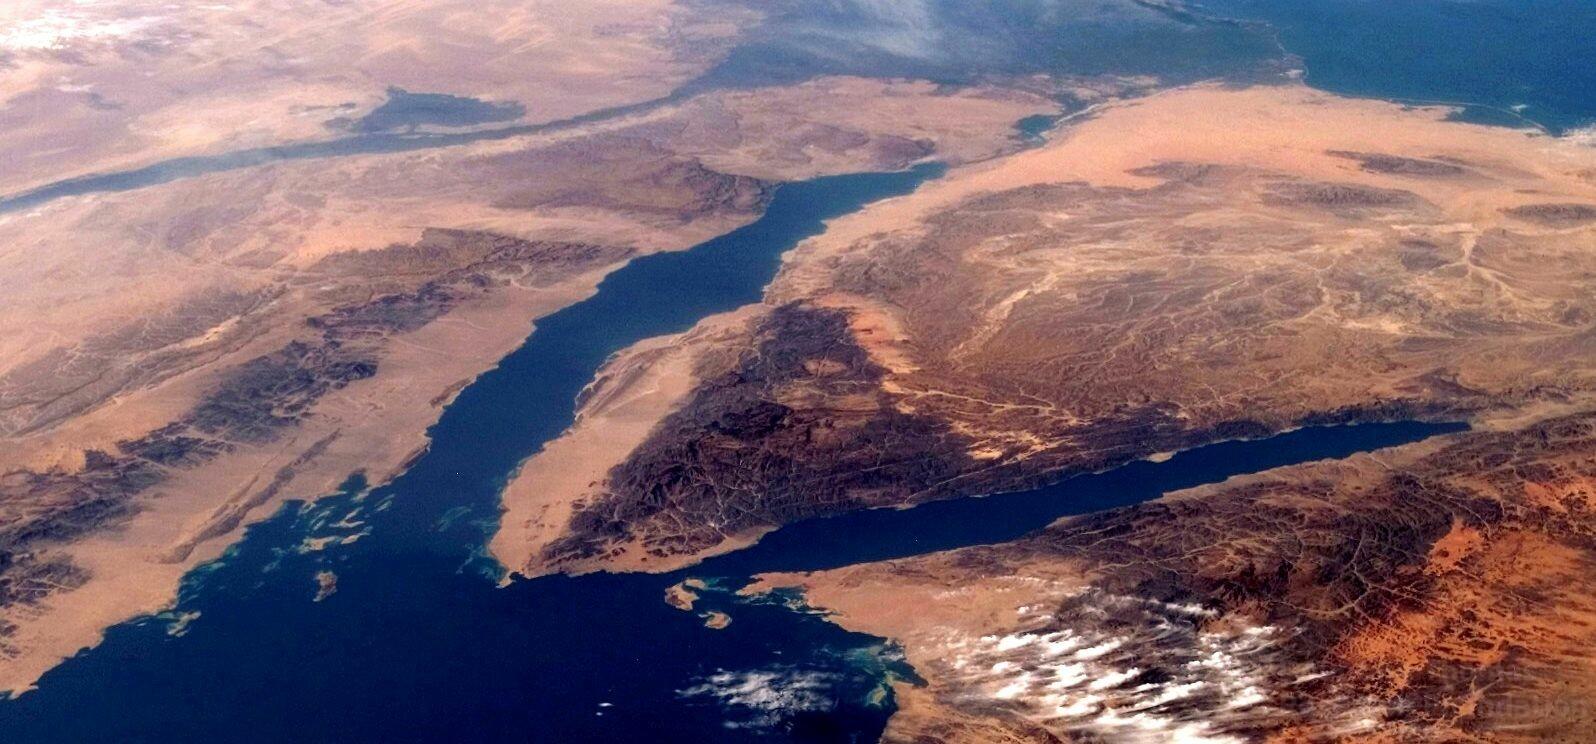 gulf of suez and aqaba red sea crossing